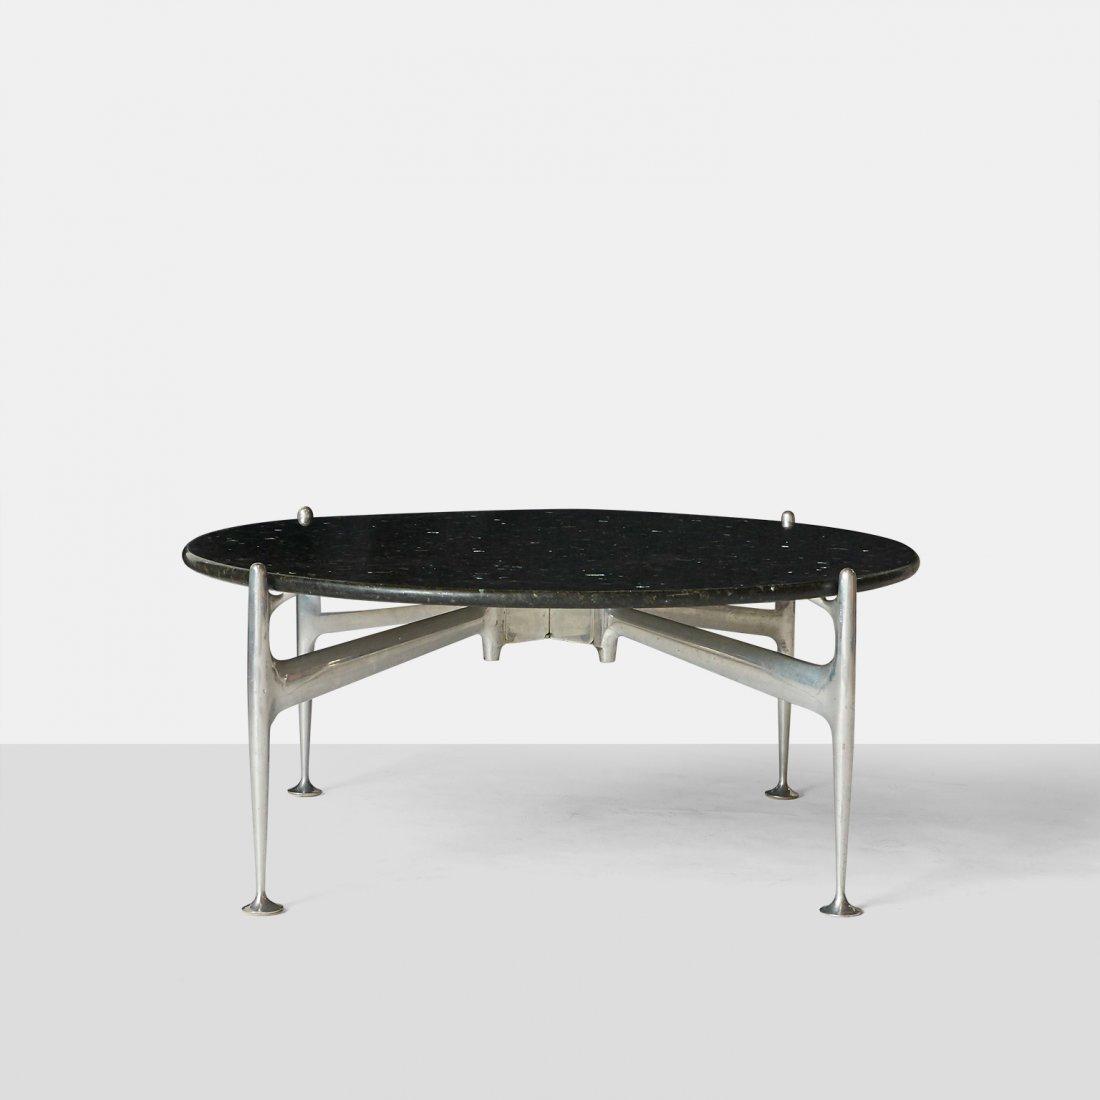 Alexander Girard, Coffee Table for Herman Miller